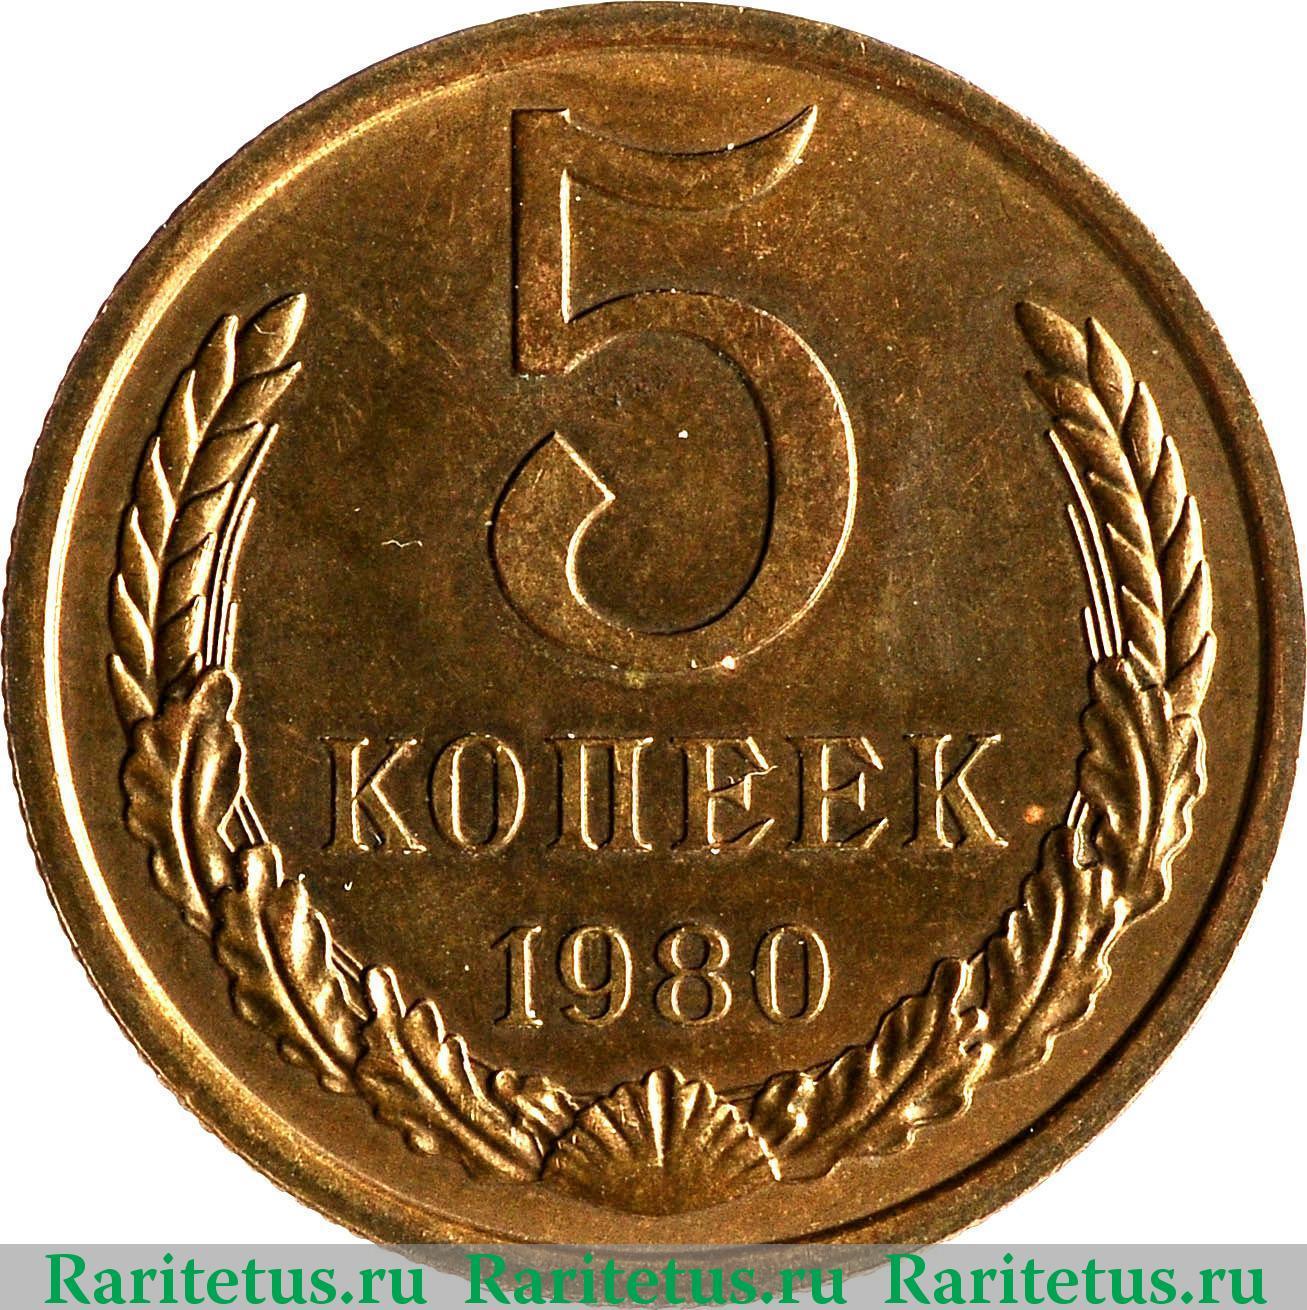 Сколько стоит 5 копеек 1980 года монеты серебро олимпиада 2016